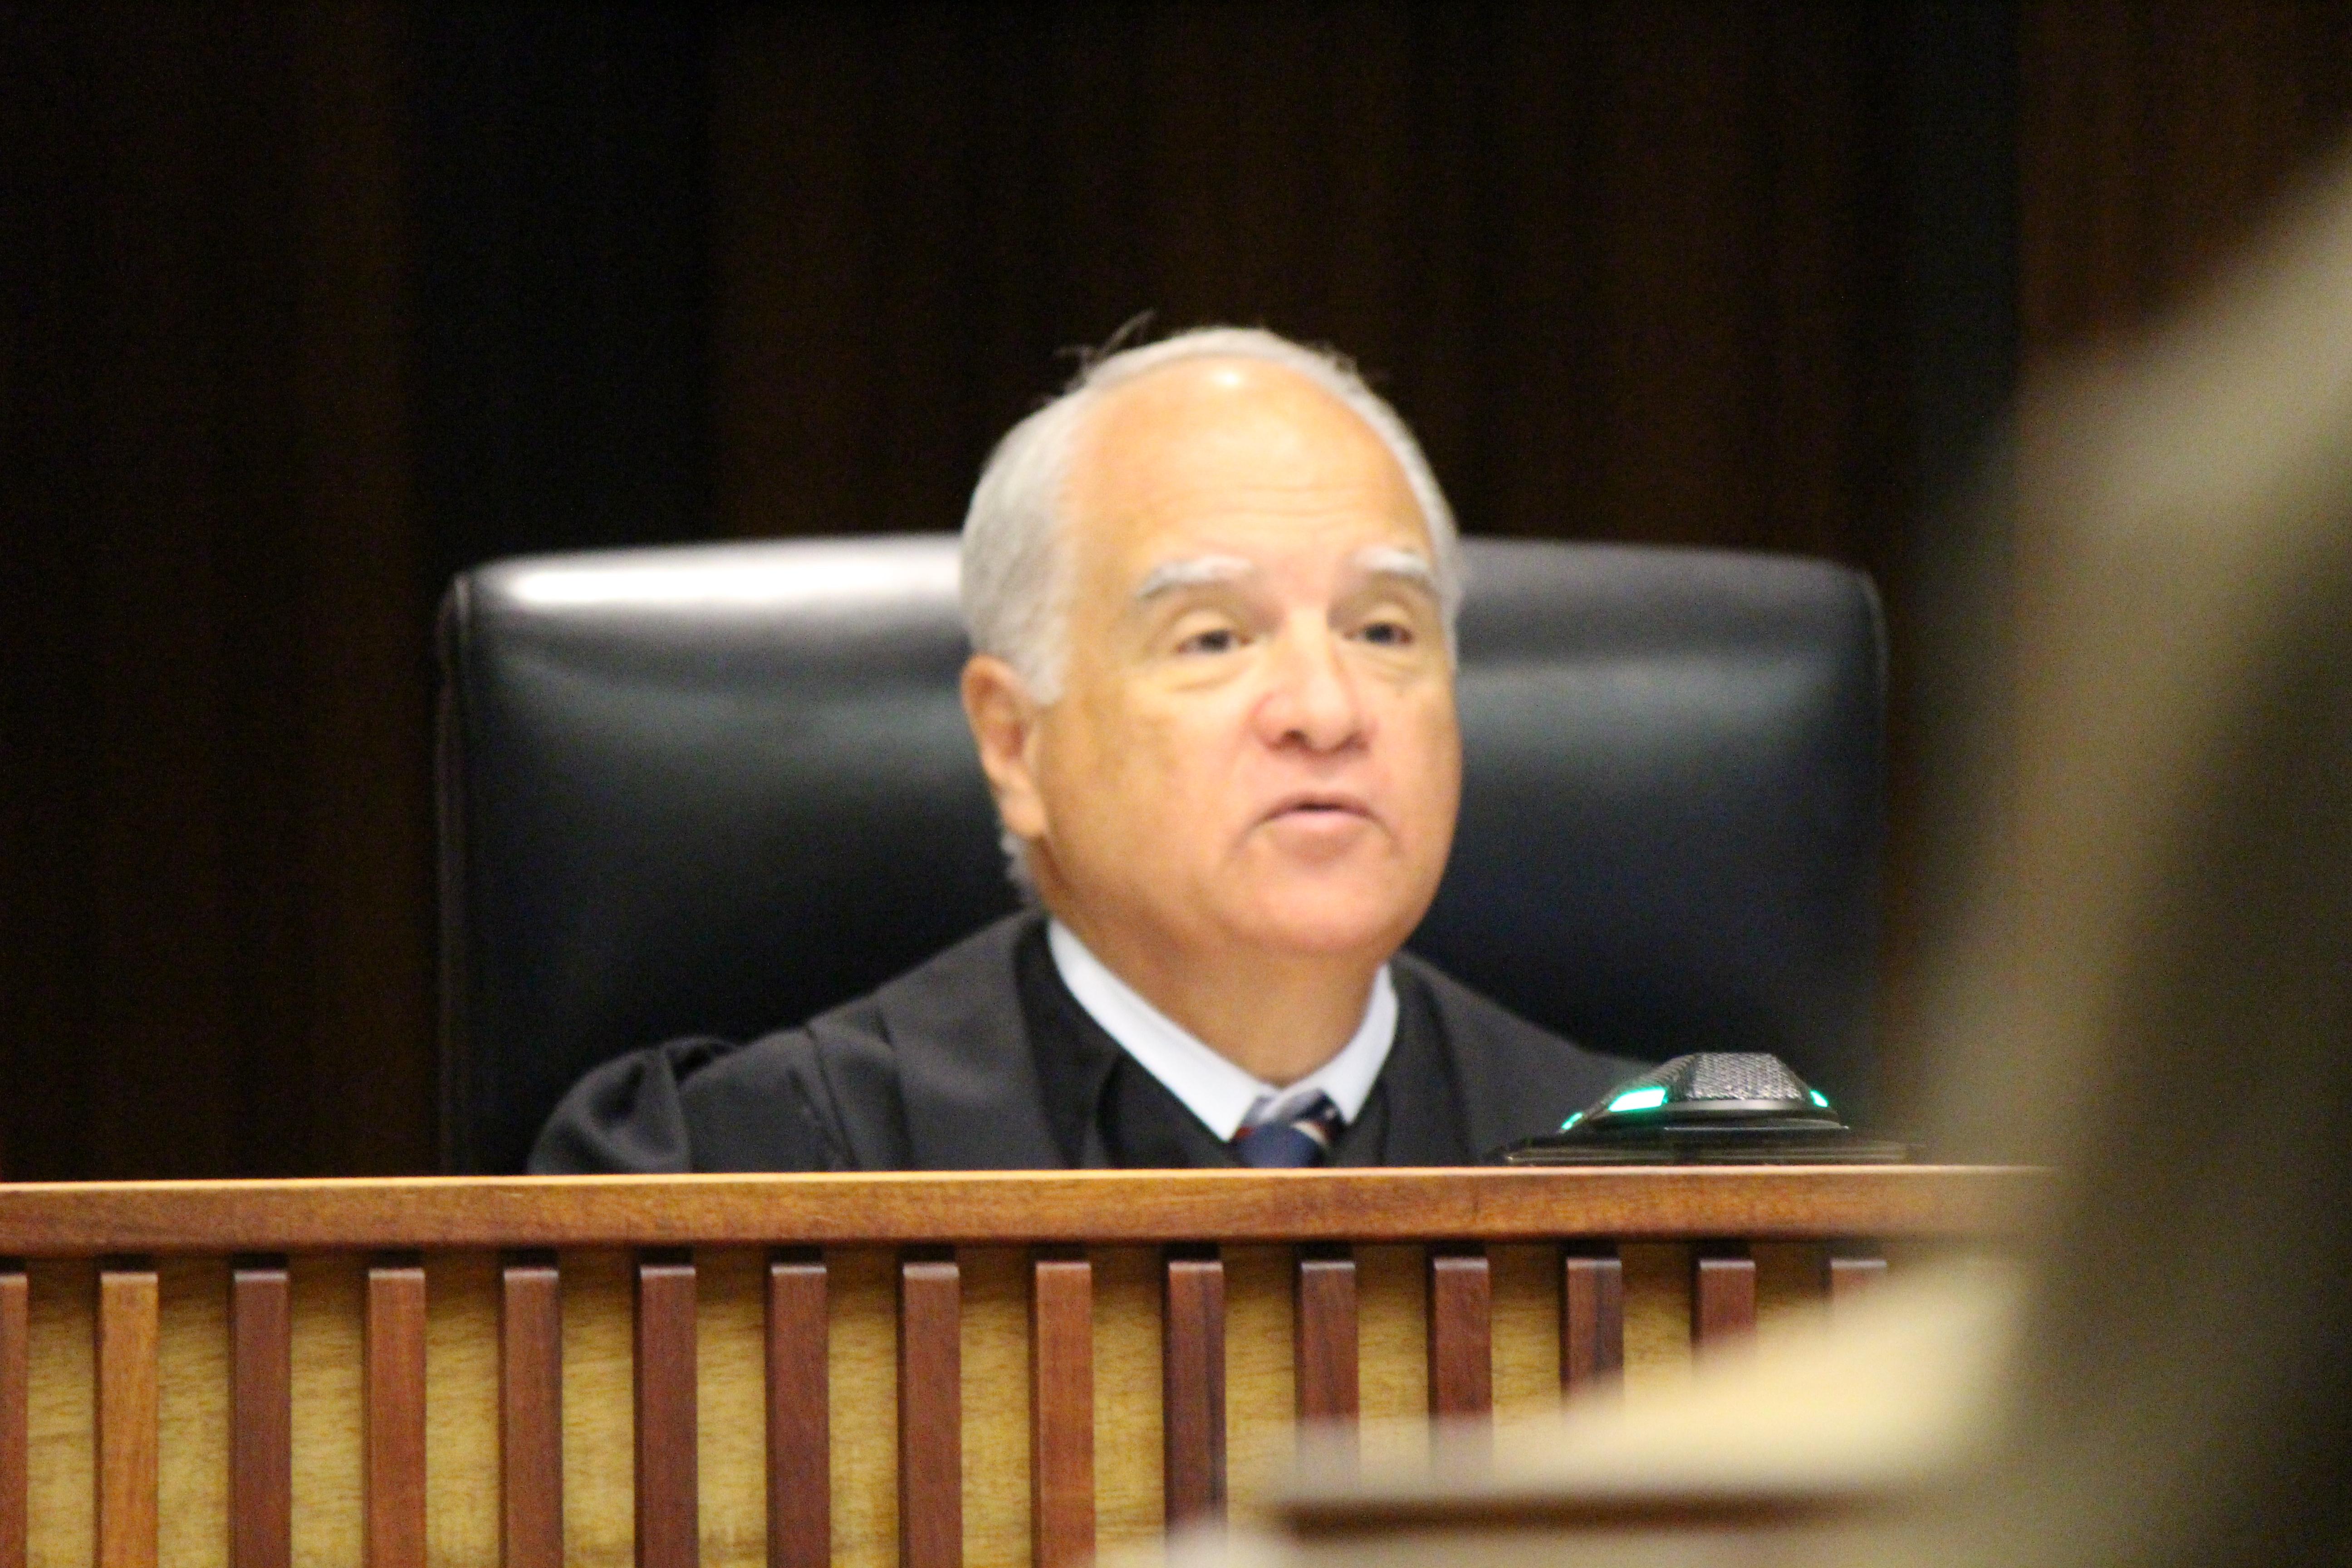 State v Capobianco trail. Judge Joseph Cardoza